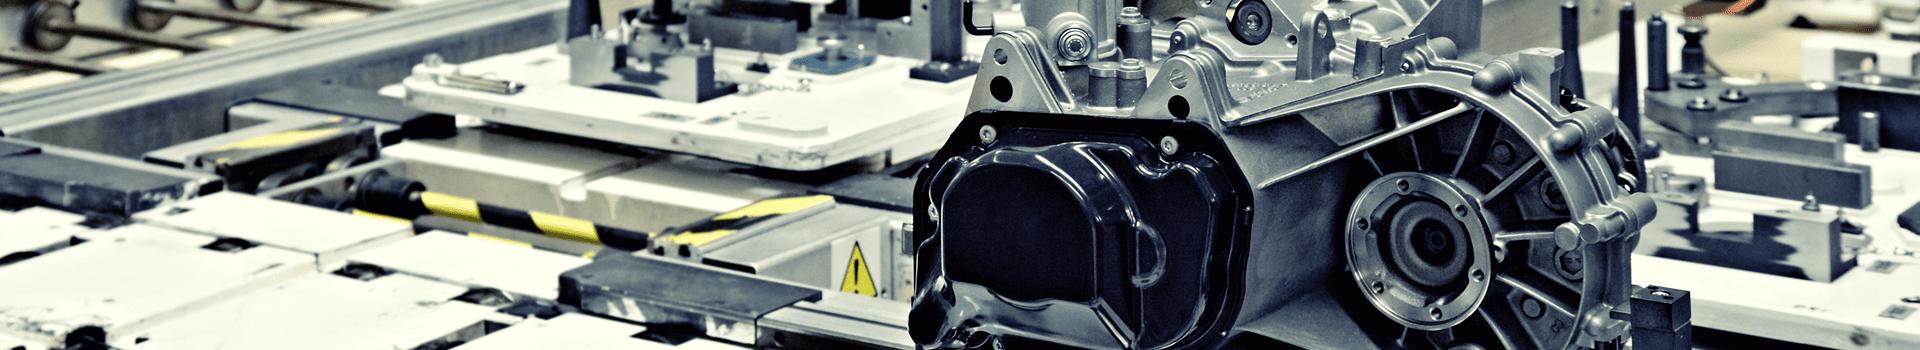 Manufacturing facility pest control